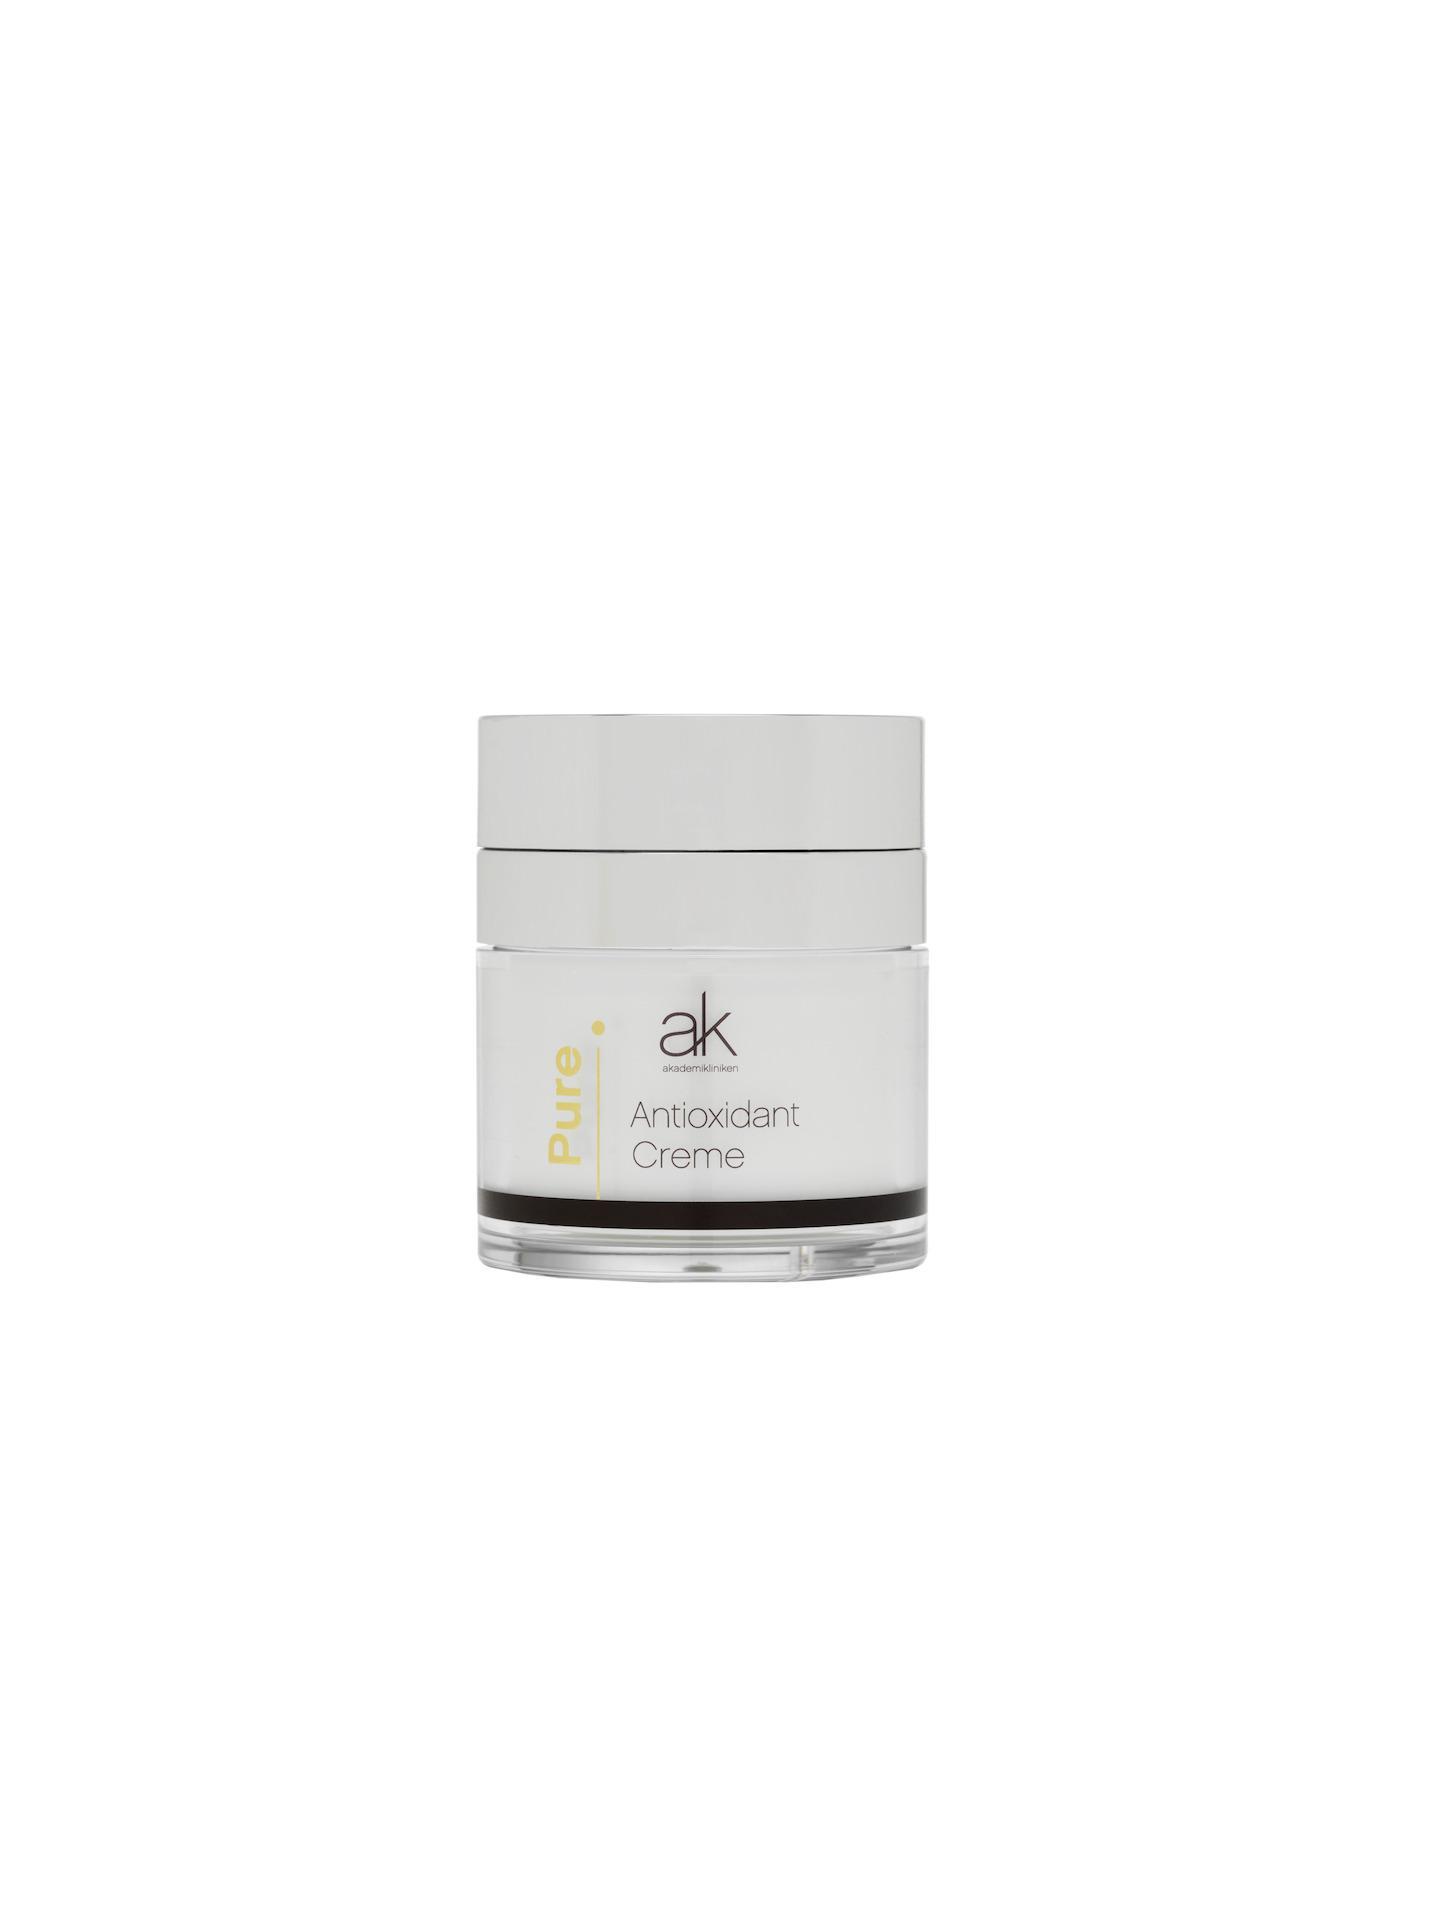 Pure Antioxidant Creme 50ml